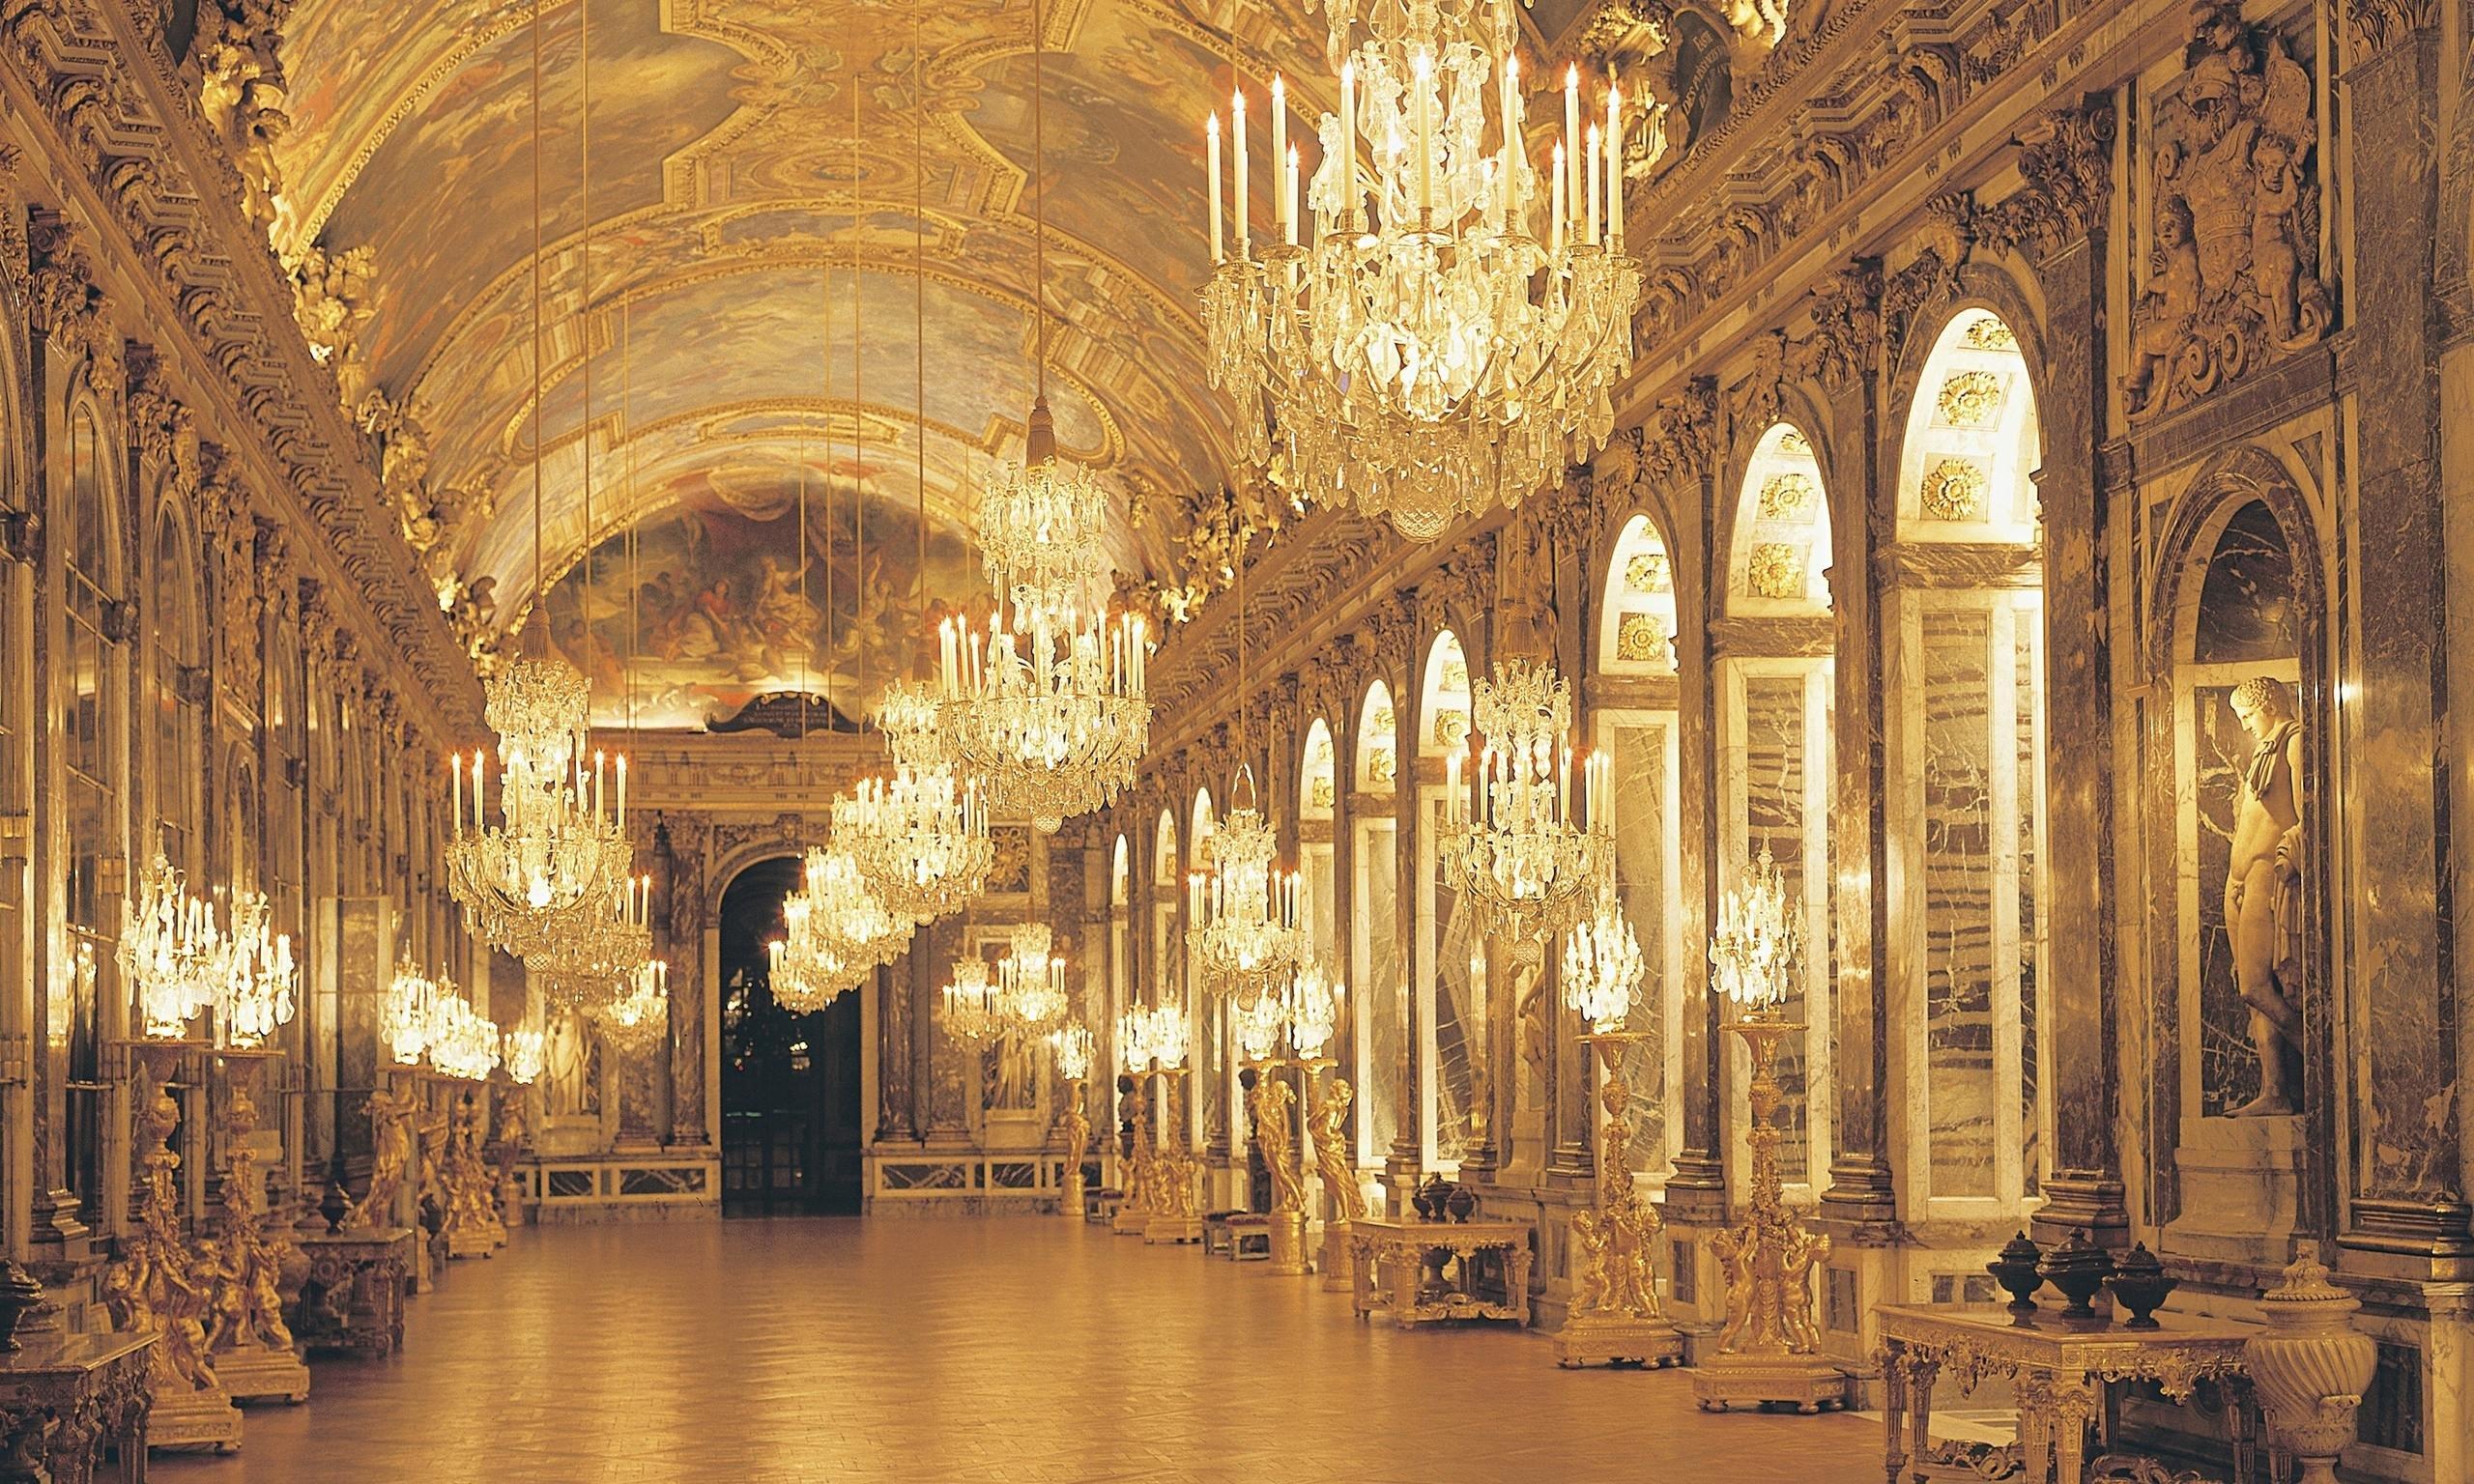 Chateau De Versailles Palace France French Building Design Room Wallpaper 2560x1536 428213